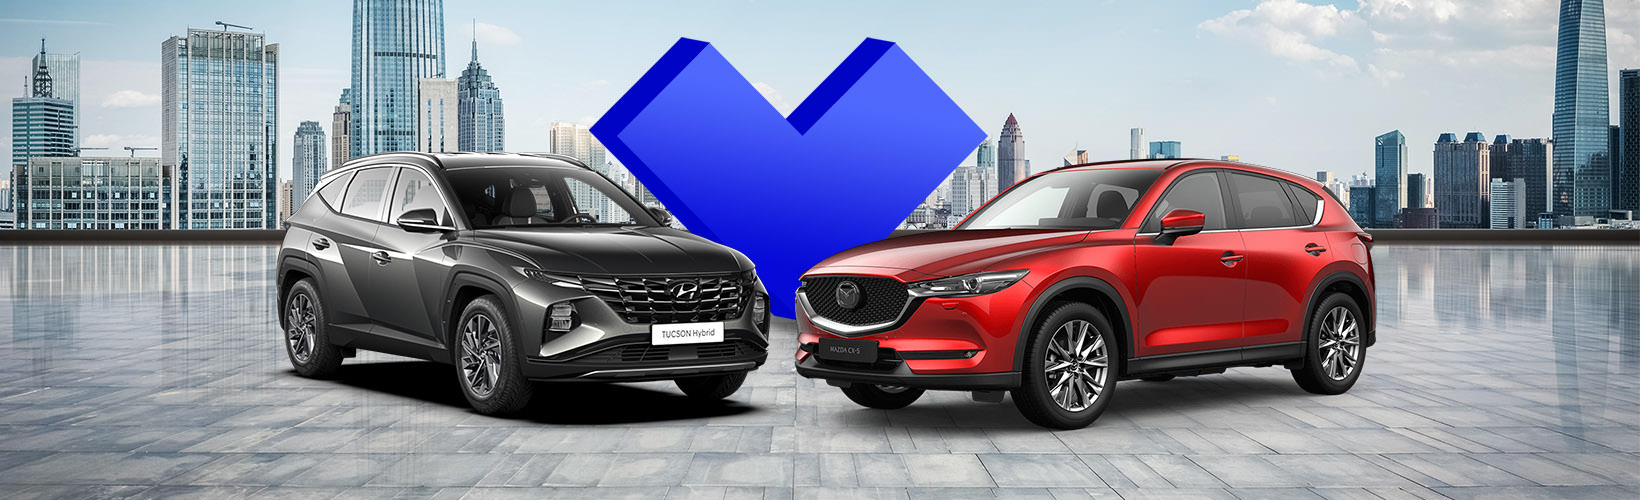 Hyundai Mazda Ivancan